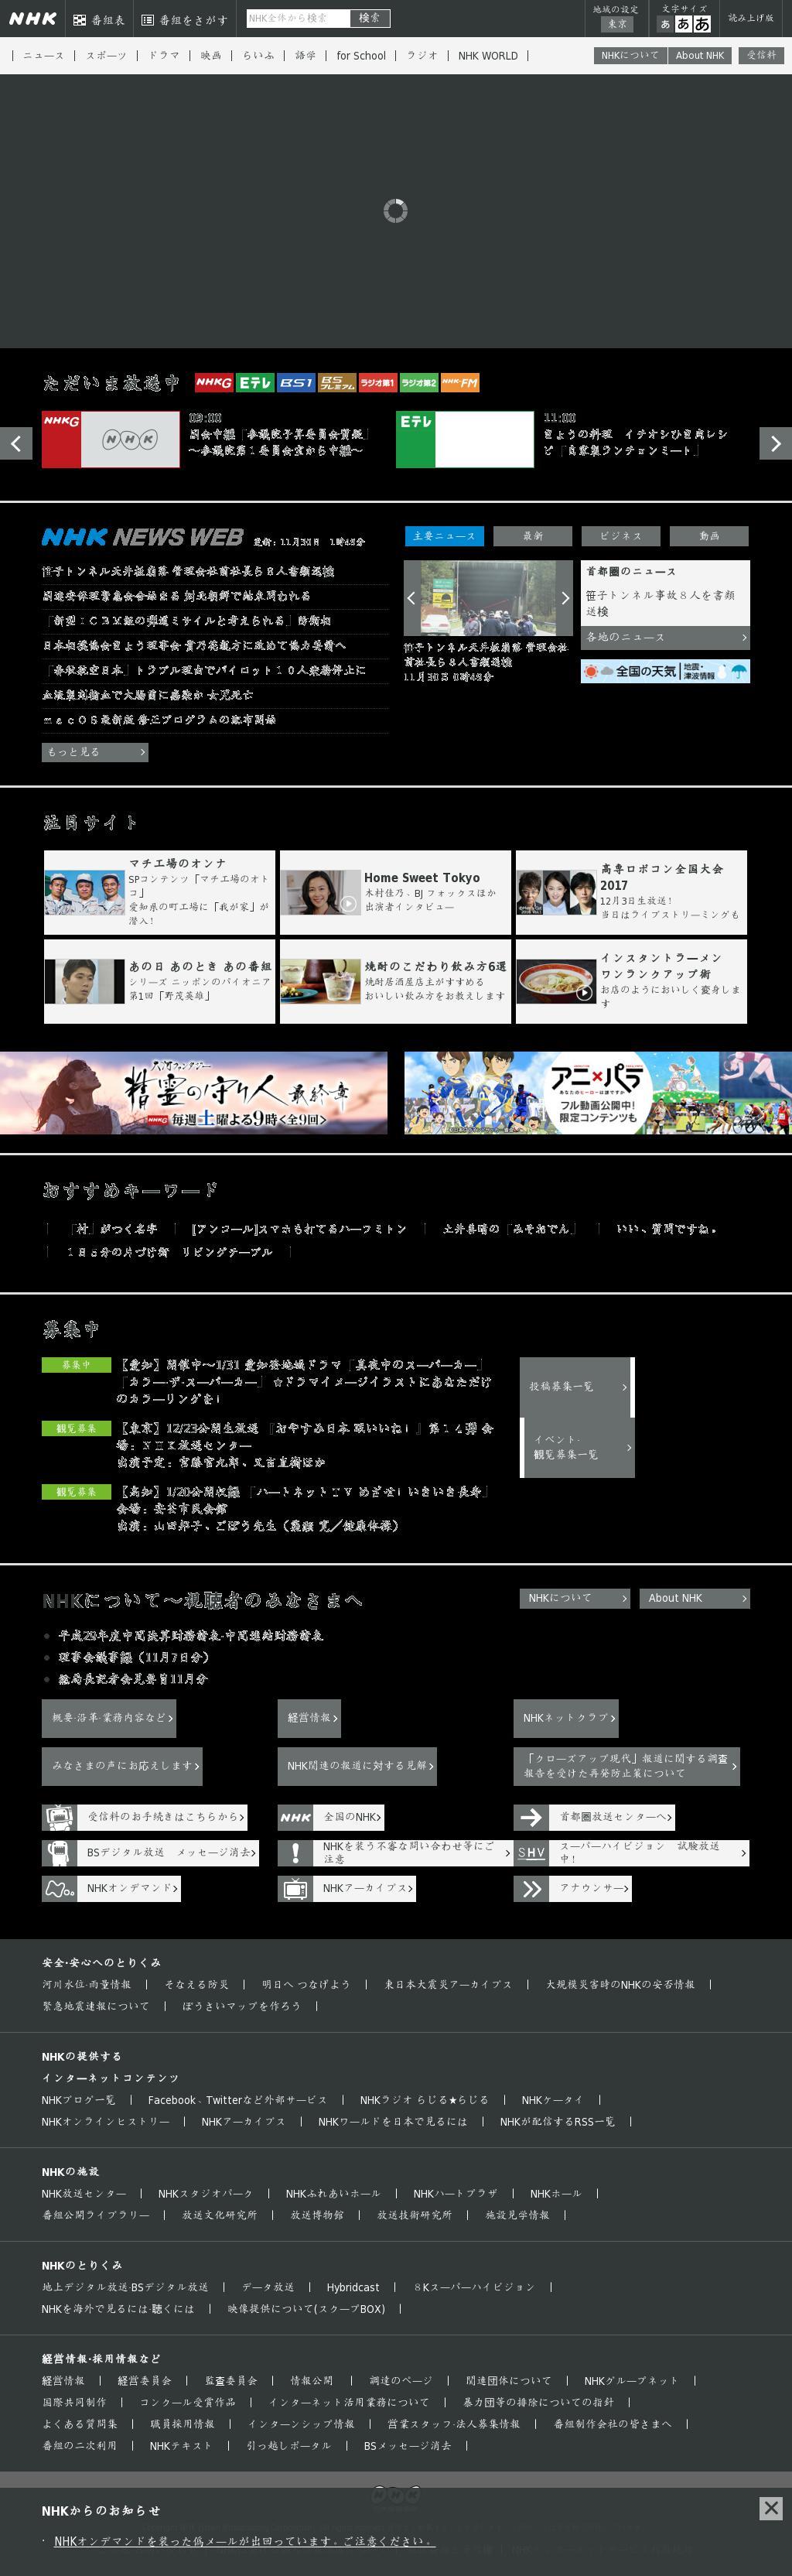 NHK Online at Sunday Jan. 21, 2018, 8:45 a.m. UTC